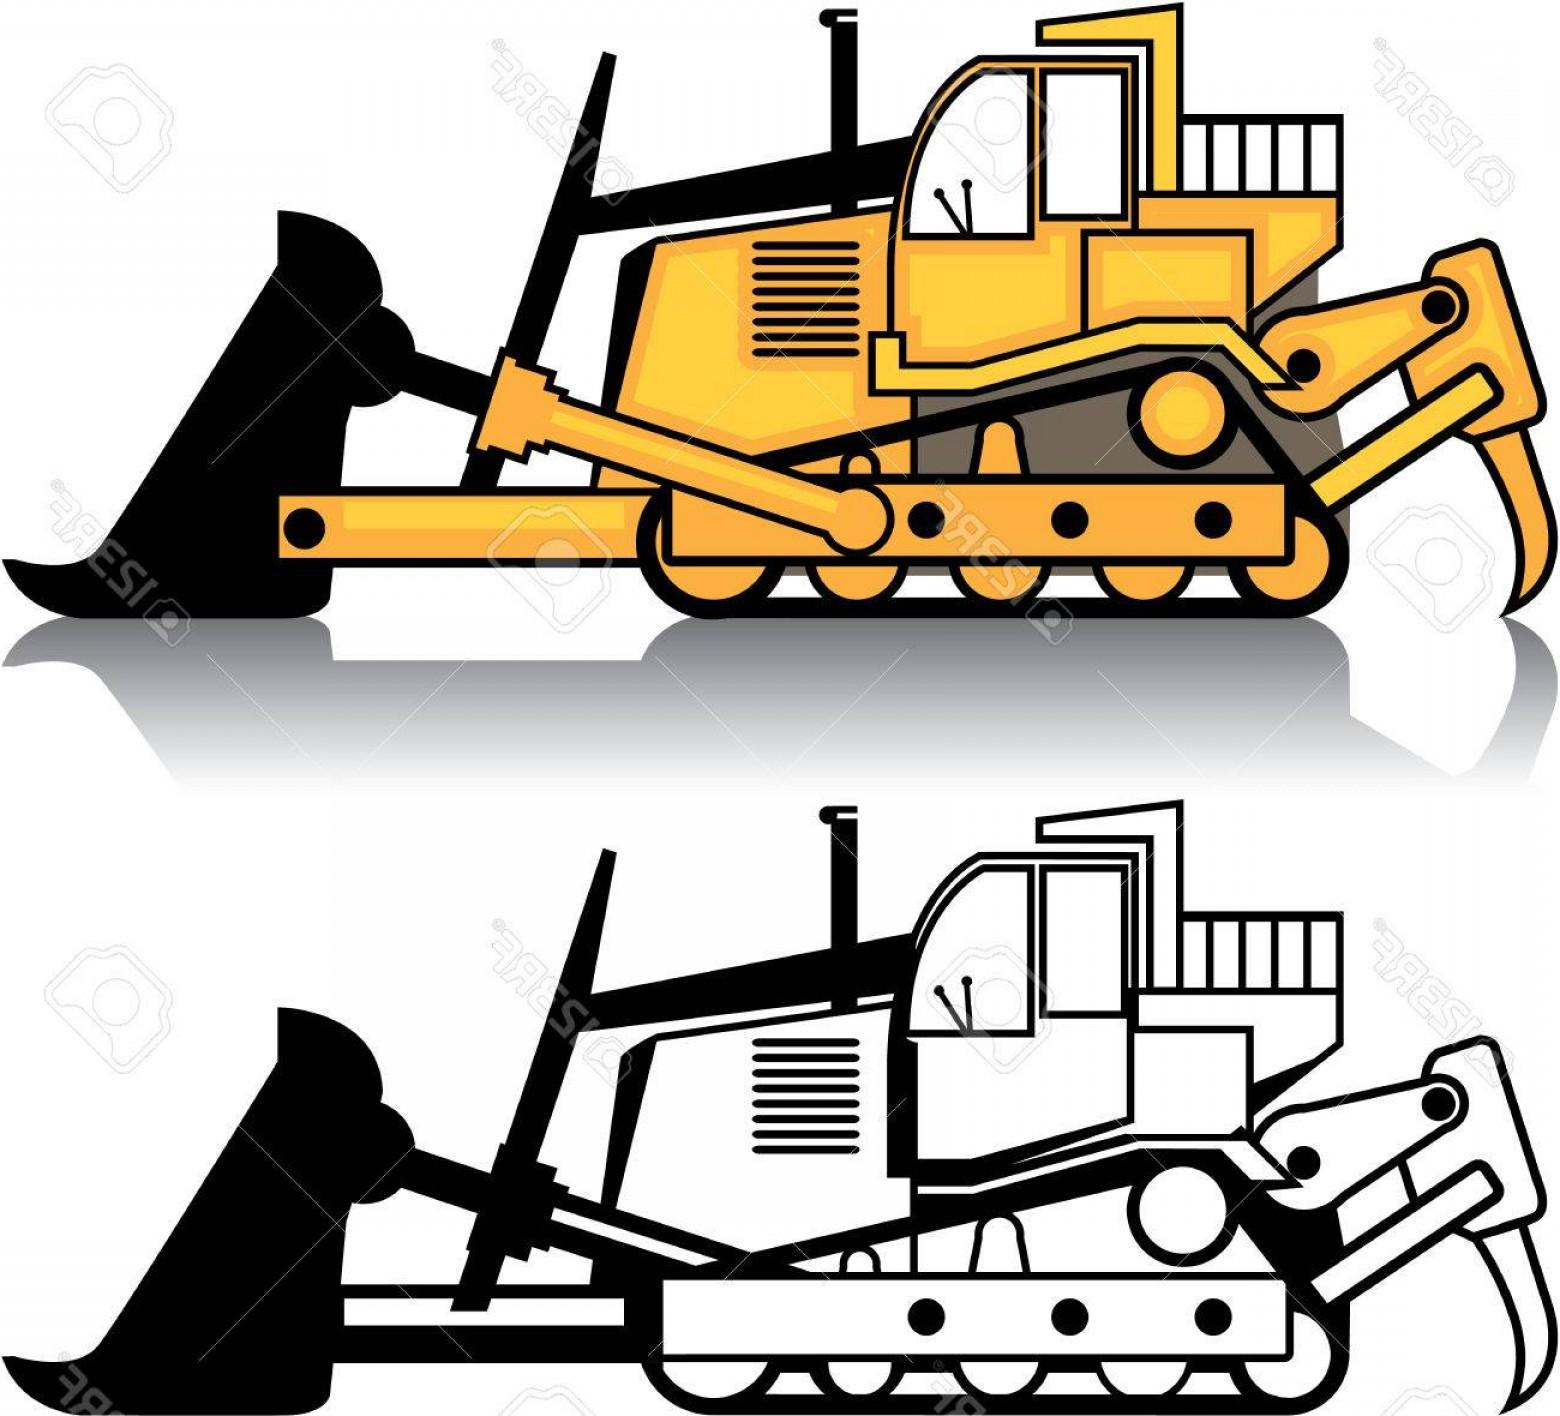 Photostock Vector Dozer Vehicle Vector Illustration Clip Art Image.